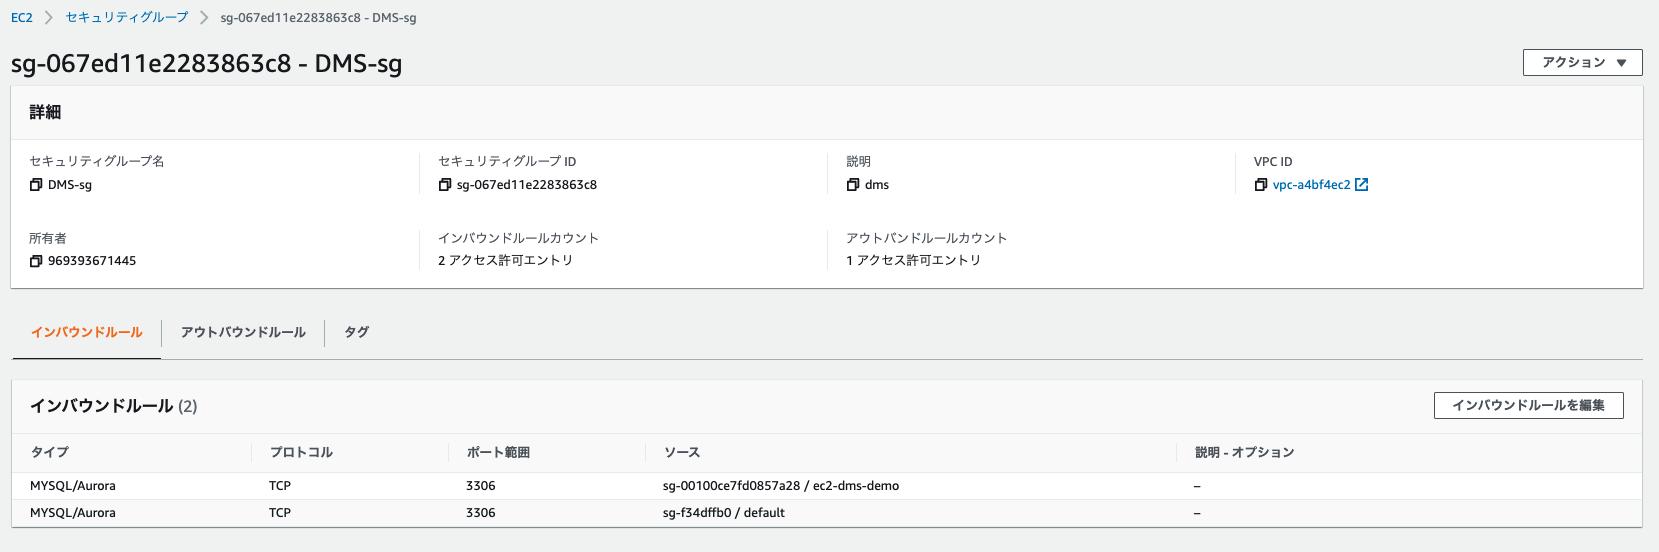 https://cdn-ssl-devio-img.classmethod.jp/wp-content/uploads/2021/06/2021-06-03_10.48.00.png